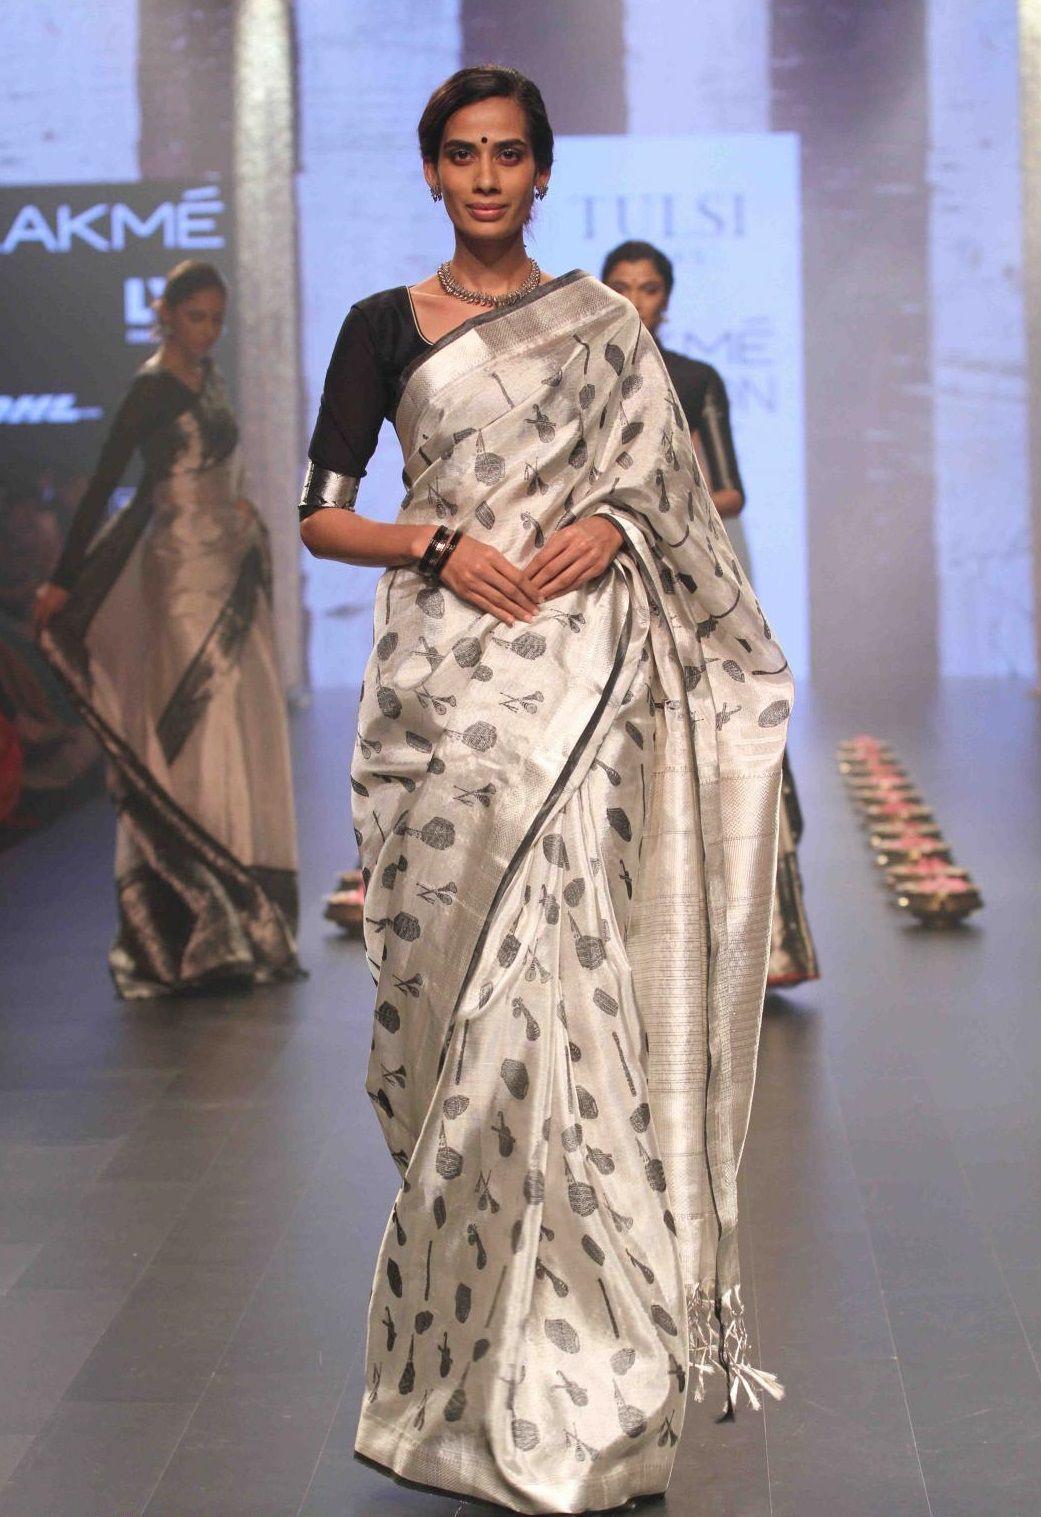 c316da4532049b Tulsi Silks amazing Kanchivaram collections by desginer Santosh Parekh was  showcased in Lakme Fashion Week and was well appreciated. Kanjivaram Silk  Saree ...